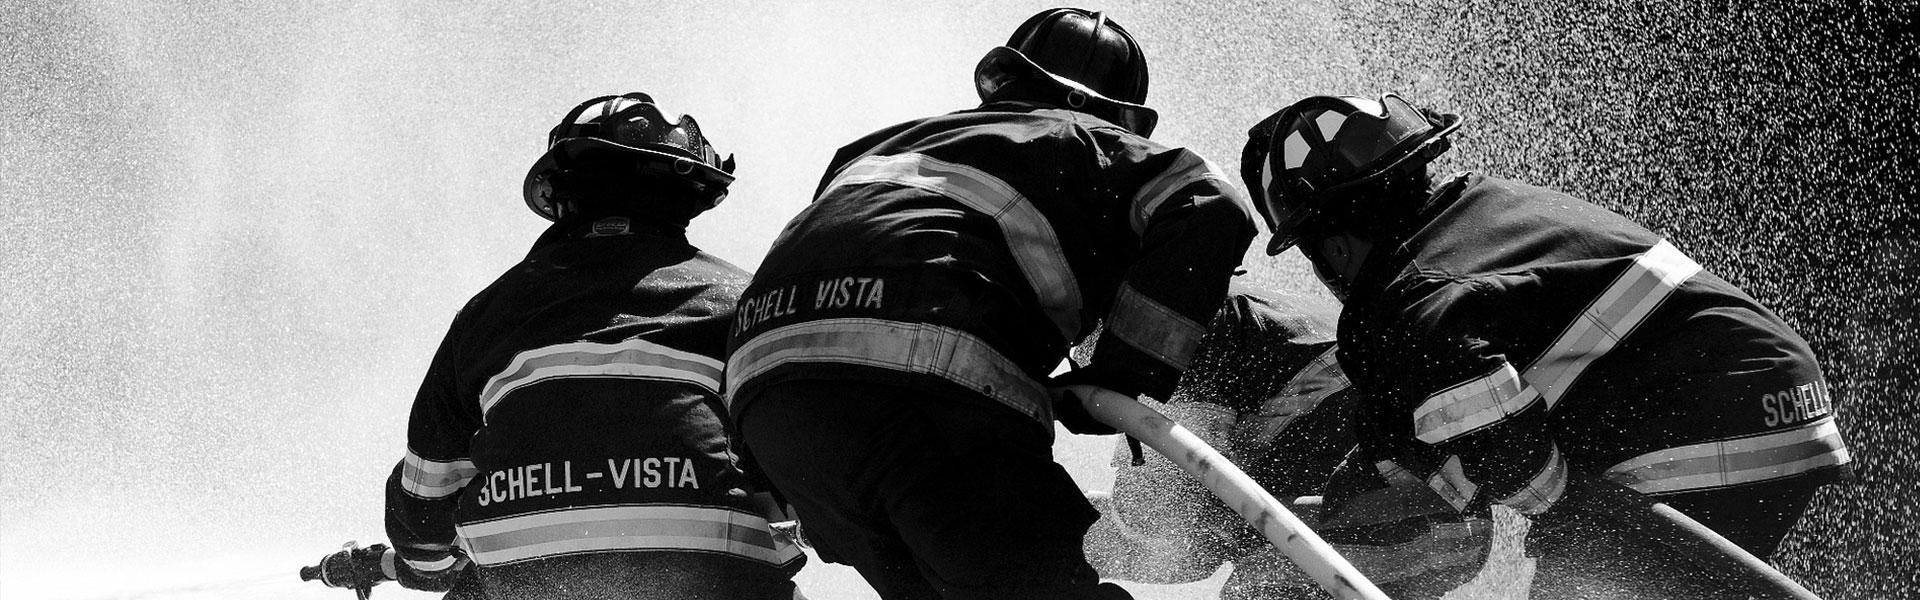 minimise fire sprinkler water damage